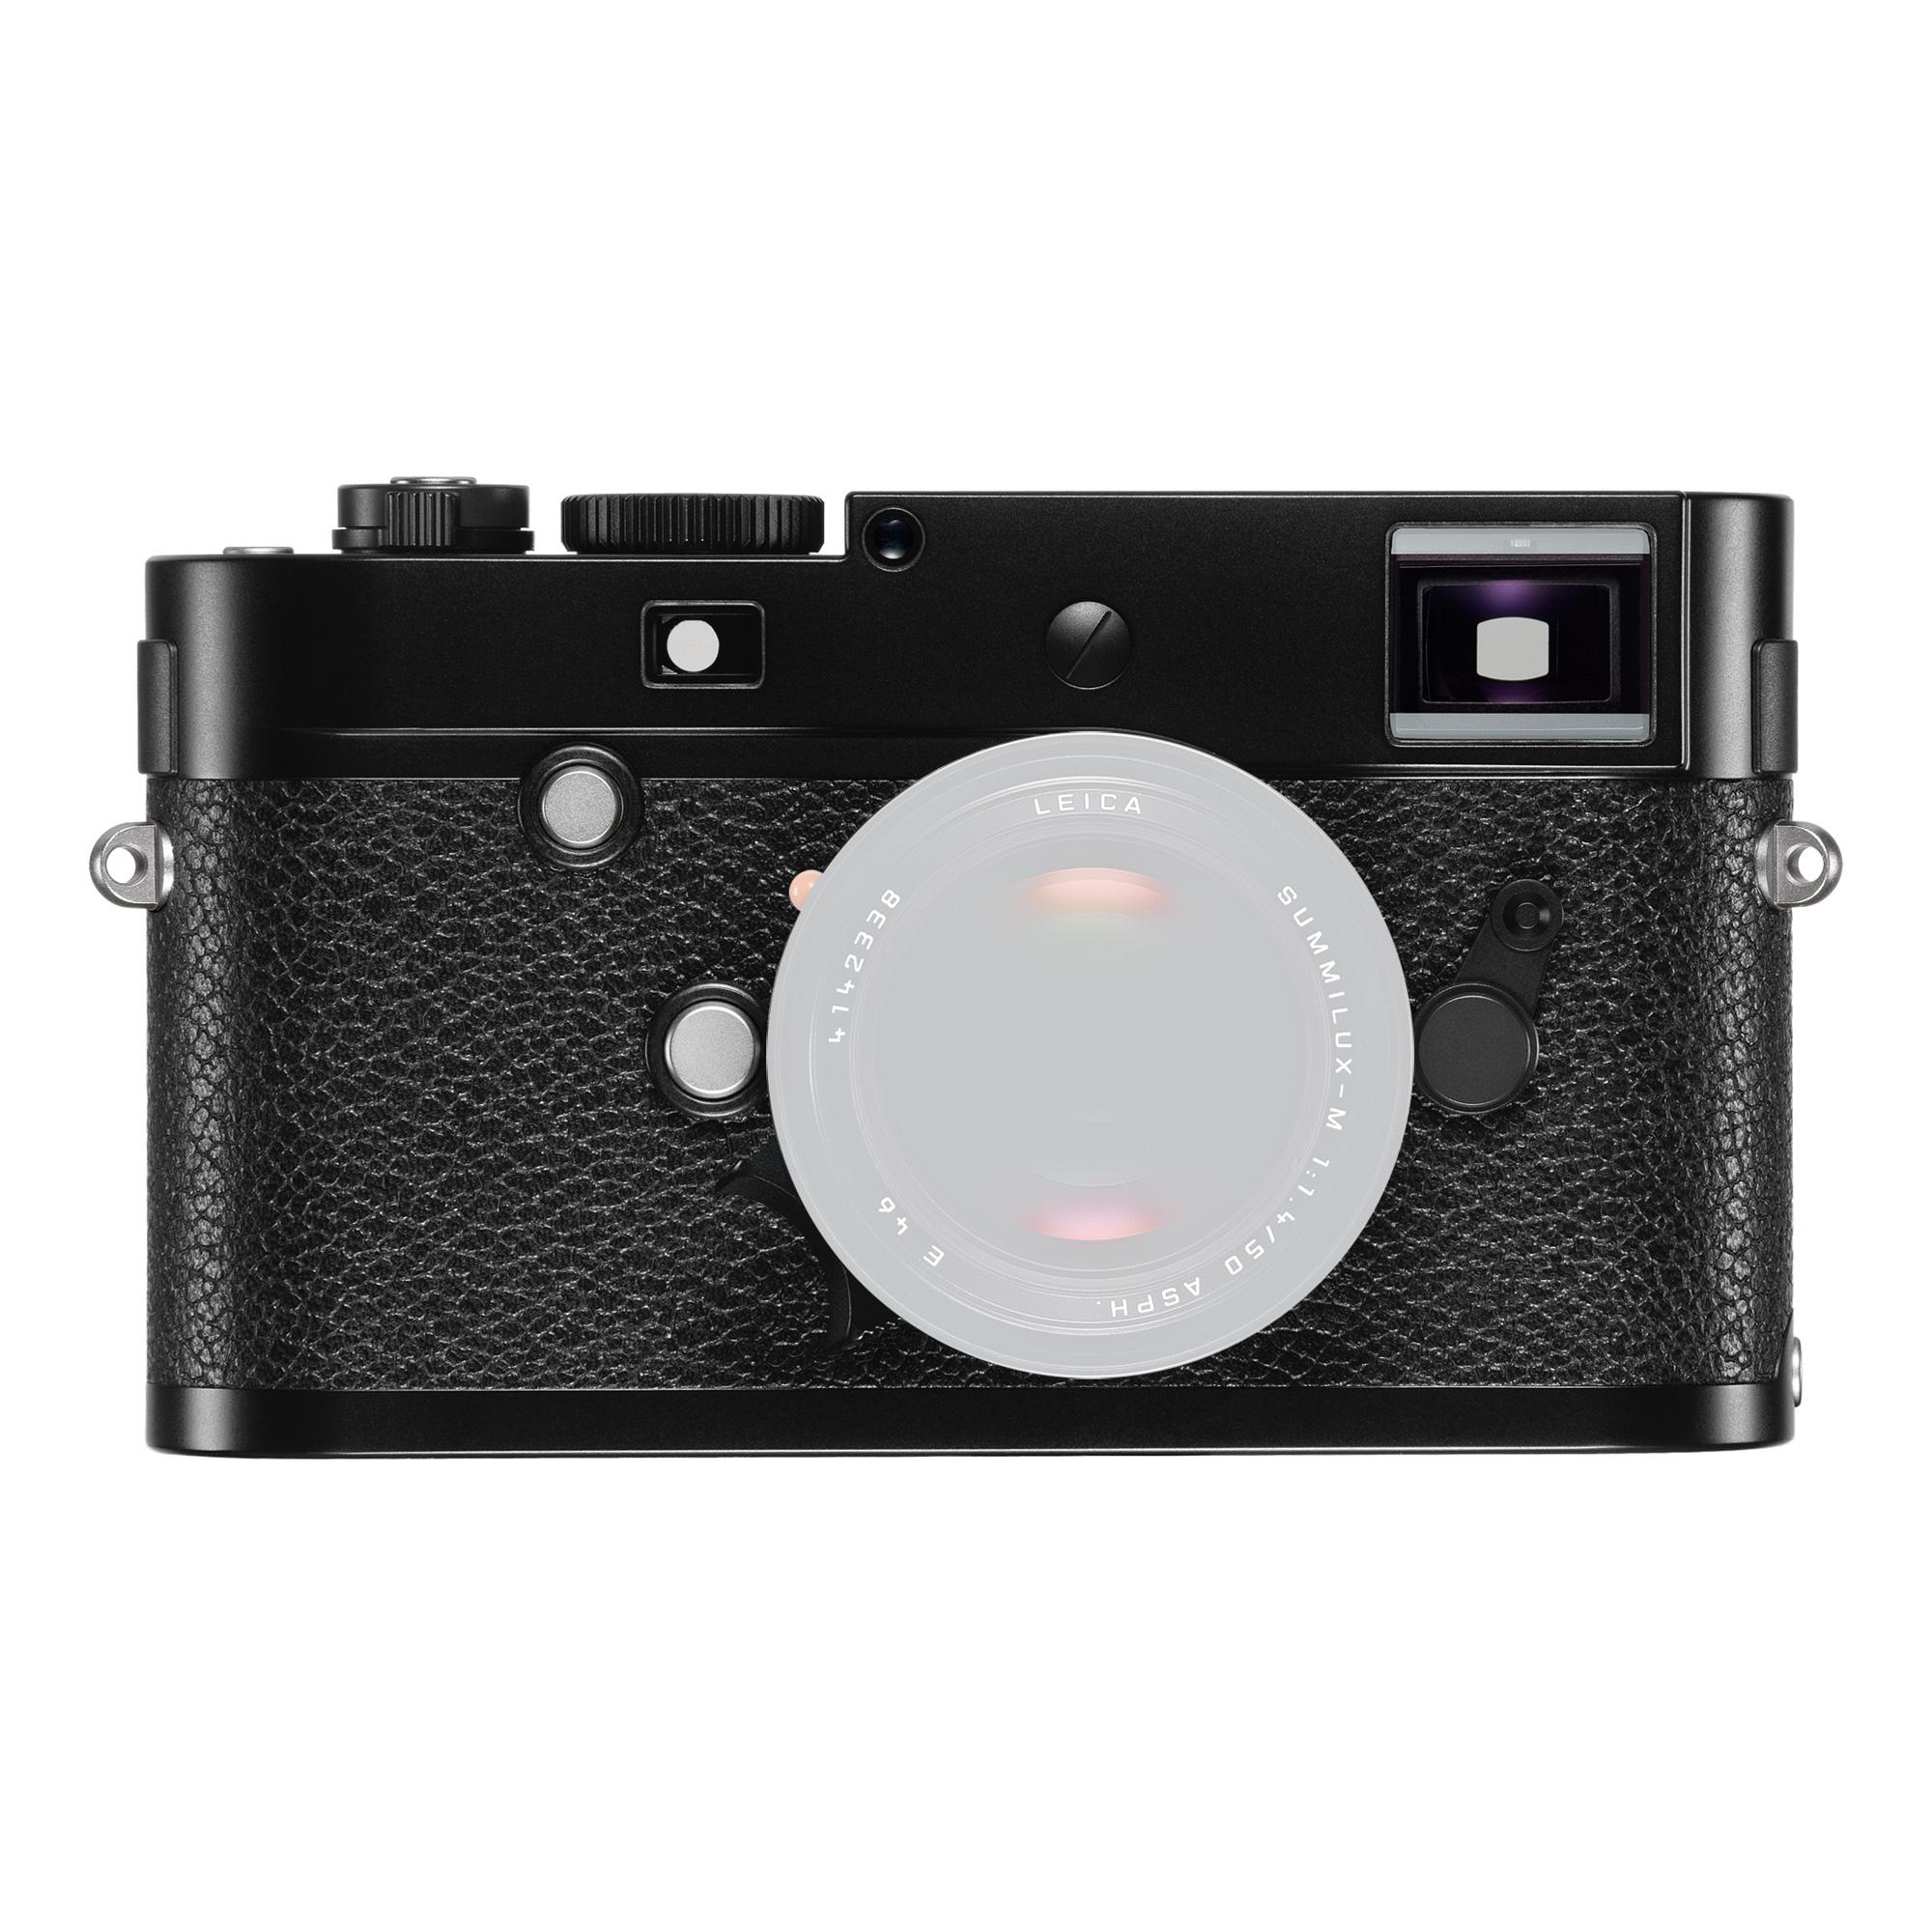 Image of Leica M-P Digital Rangefinder Camera Body (Black)